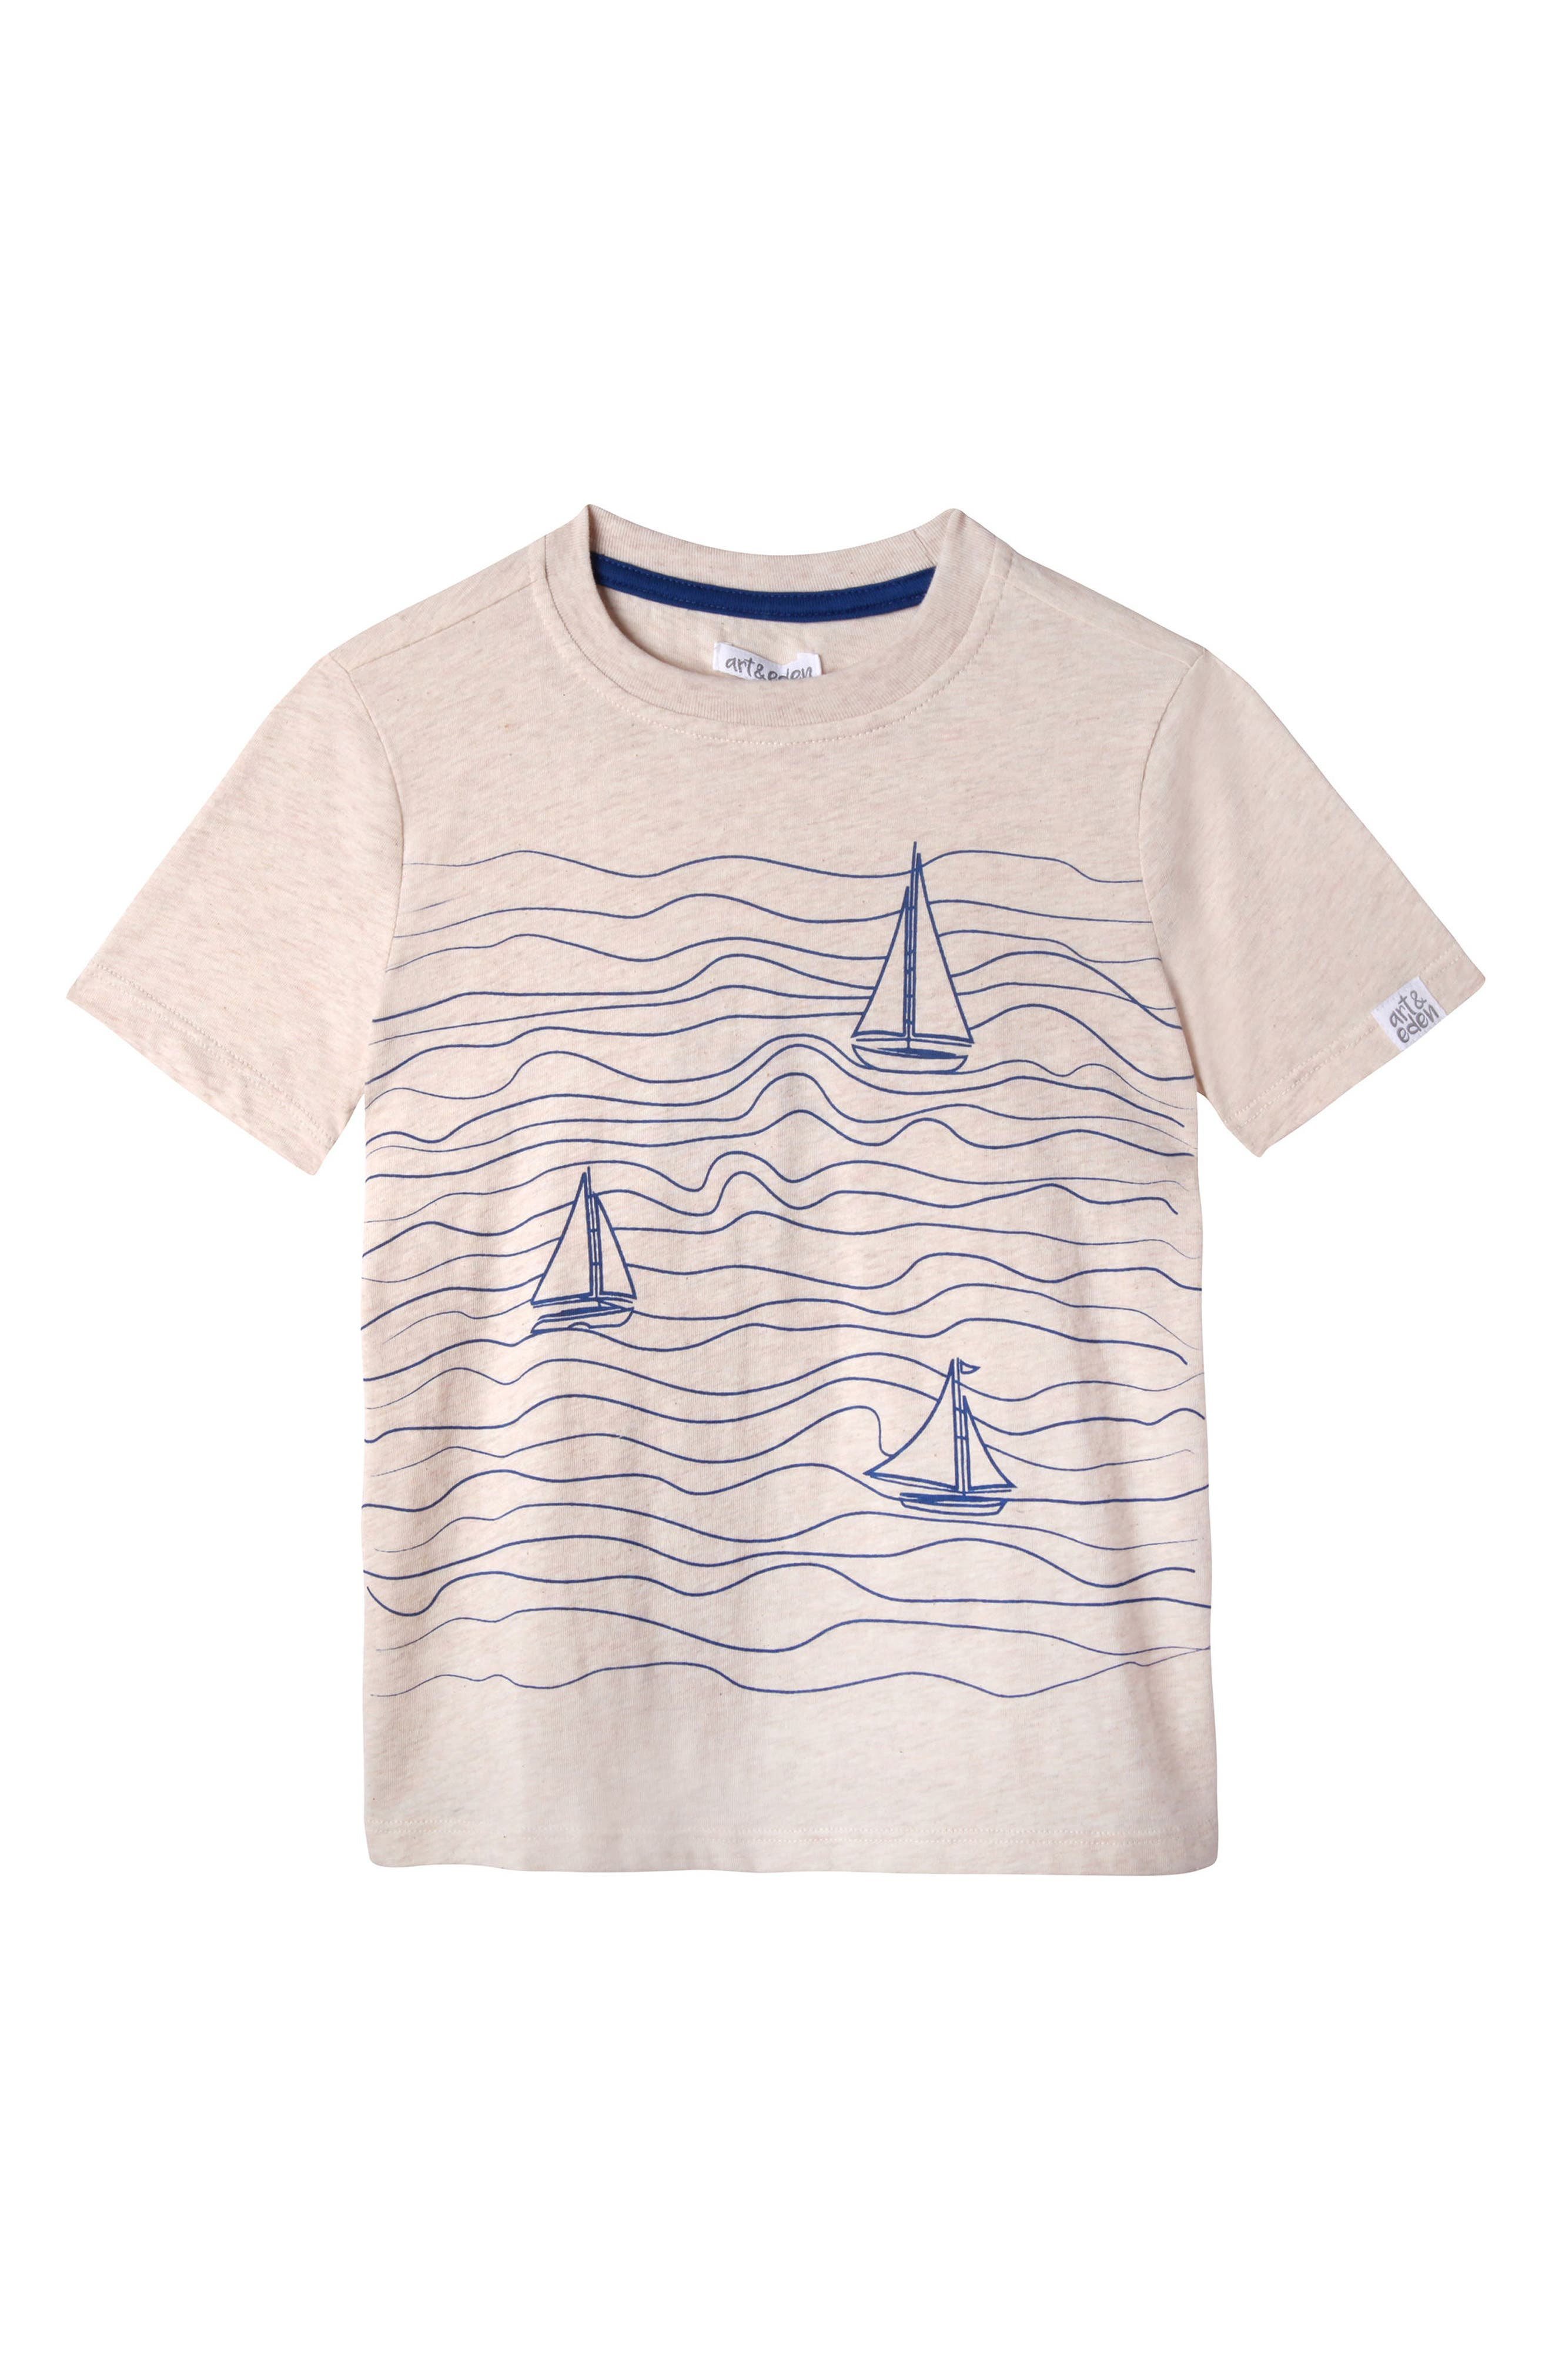 Jacob Sailboat Organic Cotton T-Shirt,                             Main thumbnail 1, color,                             Oatmeal Heather